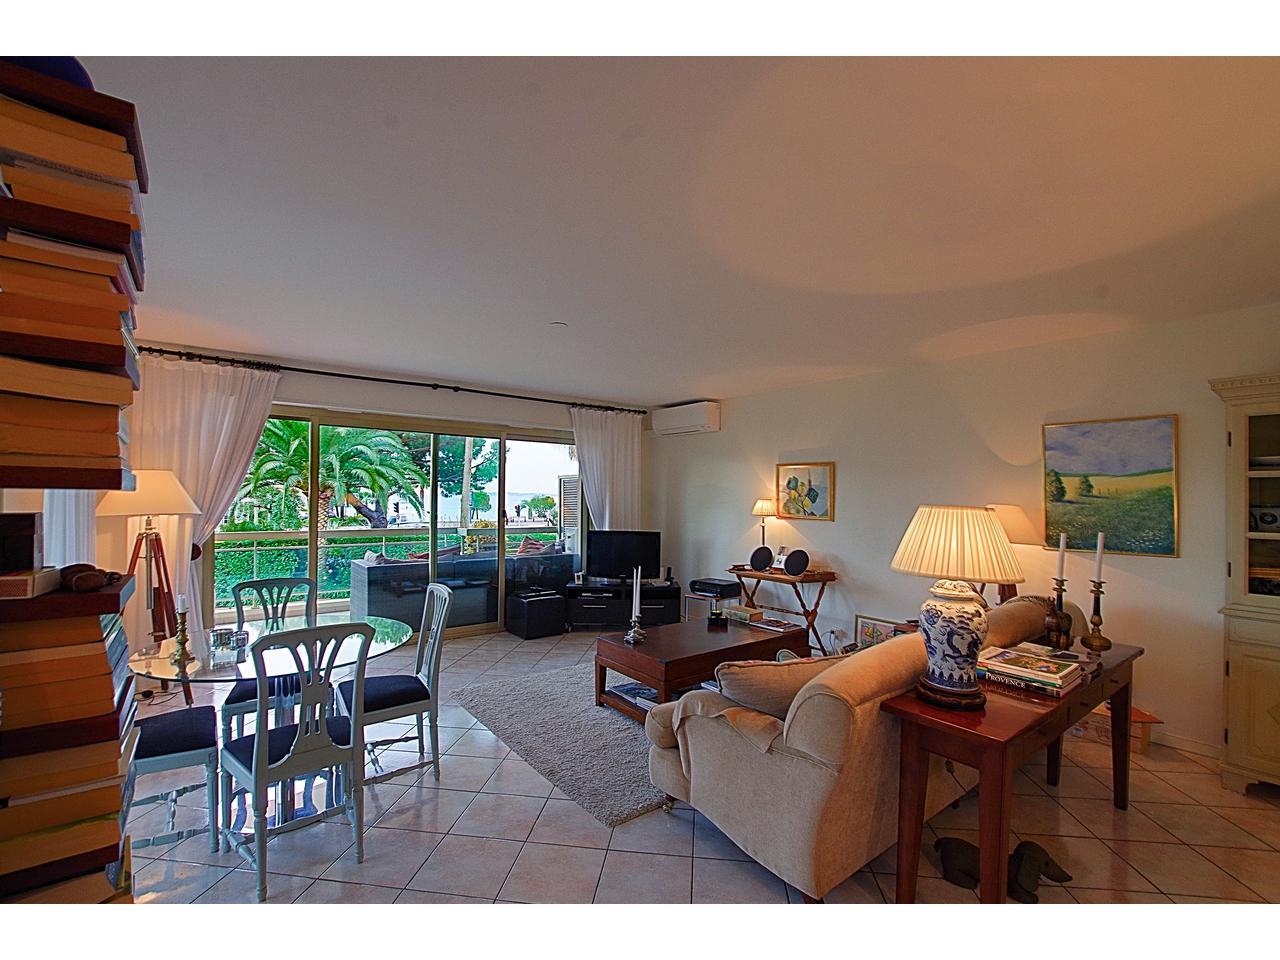 immobilier nice vue mer appartement st laurent du var saint laurent 3 pieces dans residence luxe. Black Bedroom Furniture Sets. Home Design Ideas